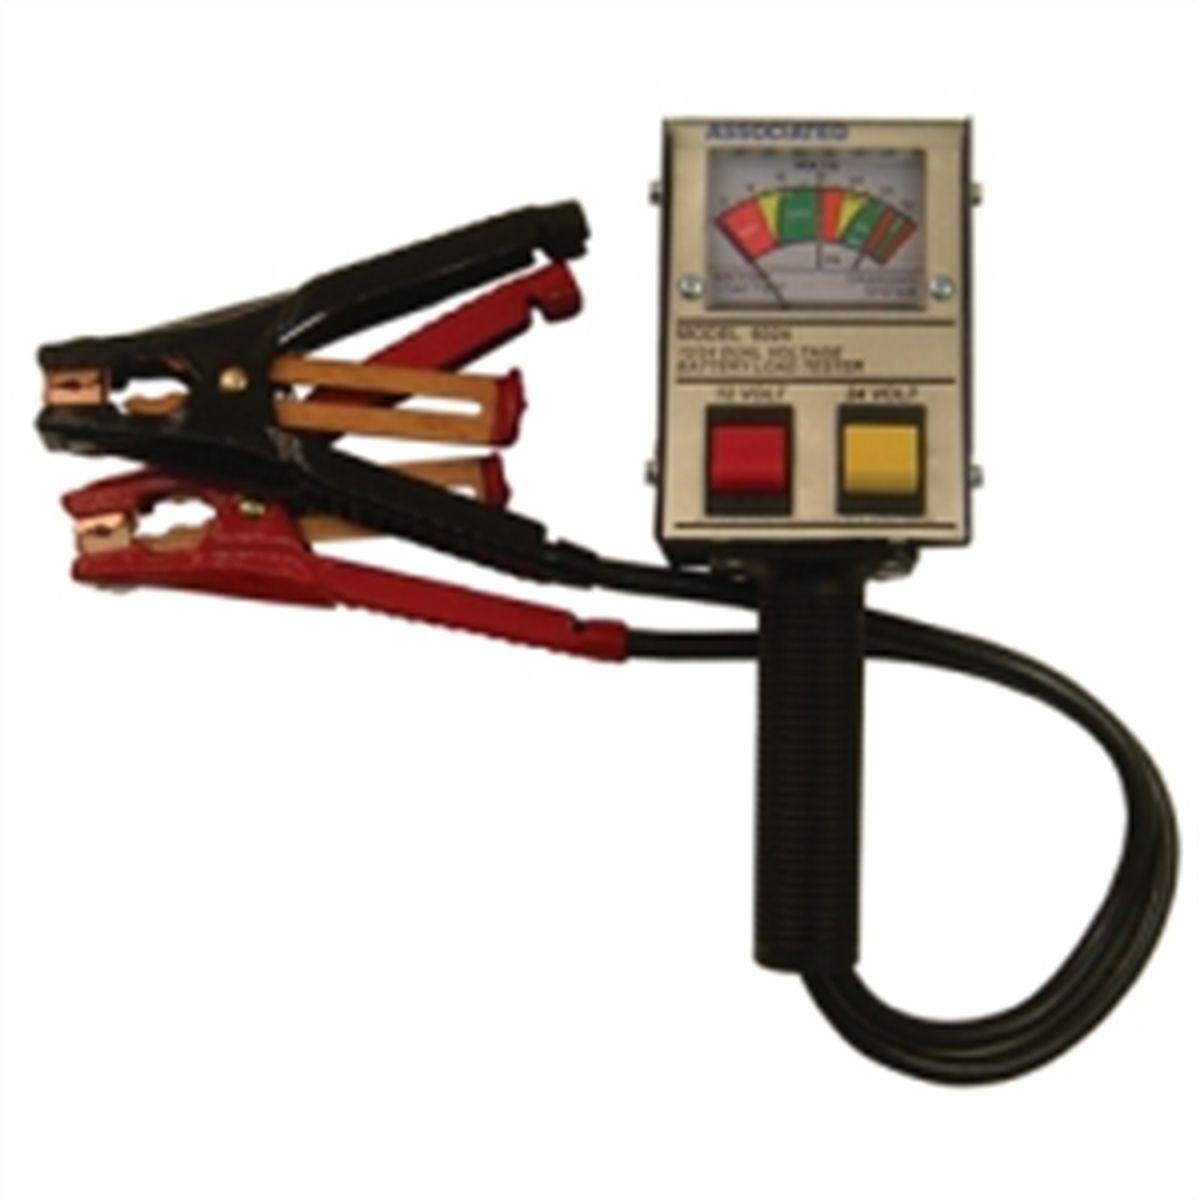 24 Volt Battery Load Tester : V load battery tester associated equipment